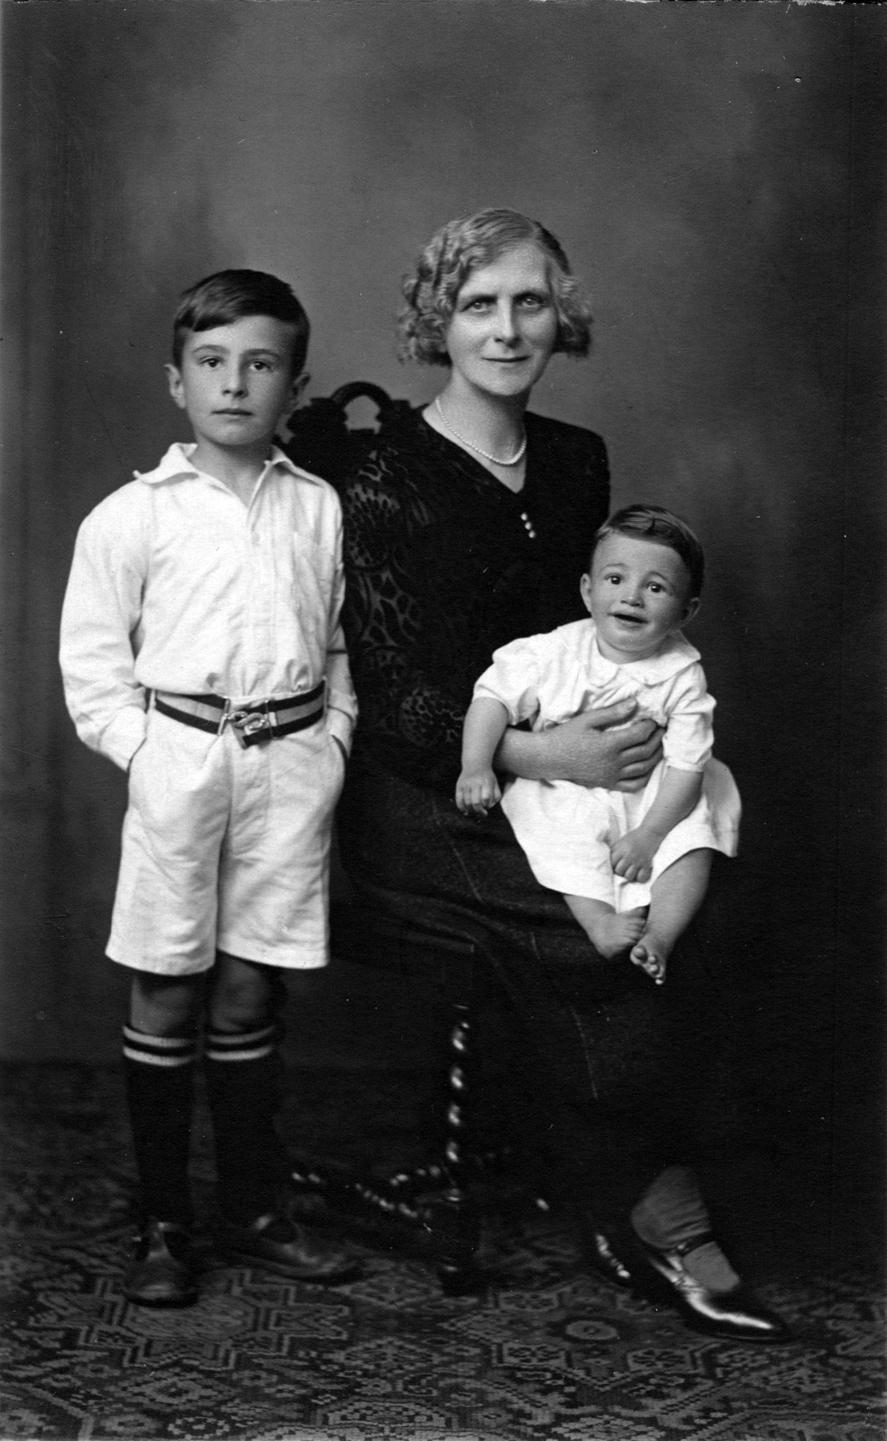 Studio Portrait Grandmother With Her Grandsons c.1933